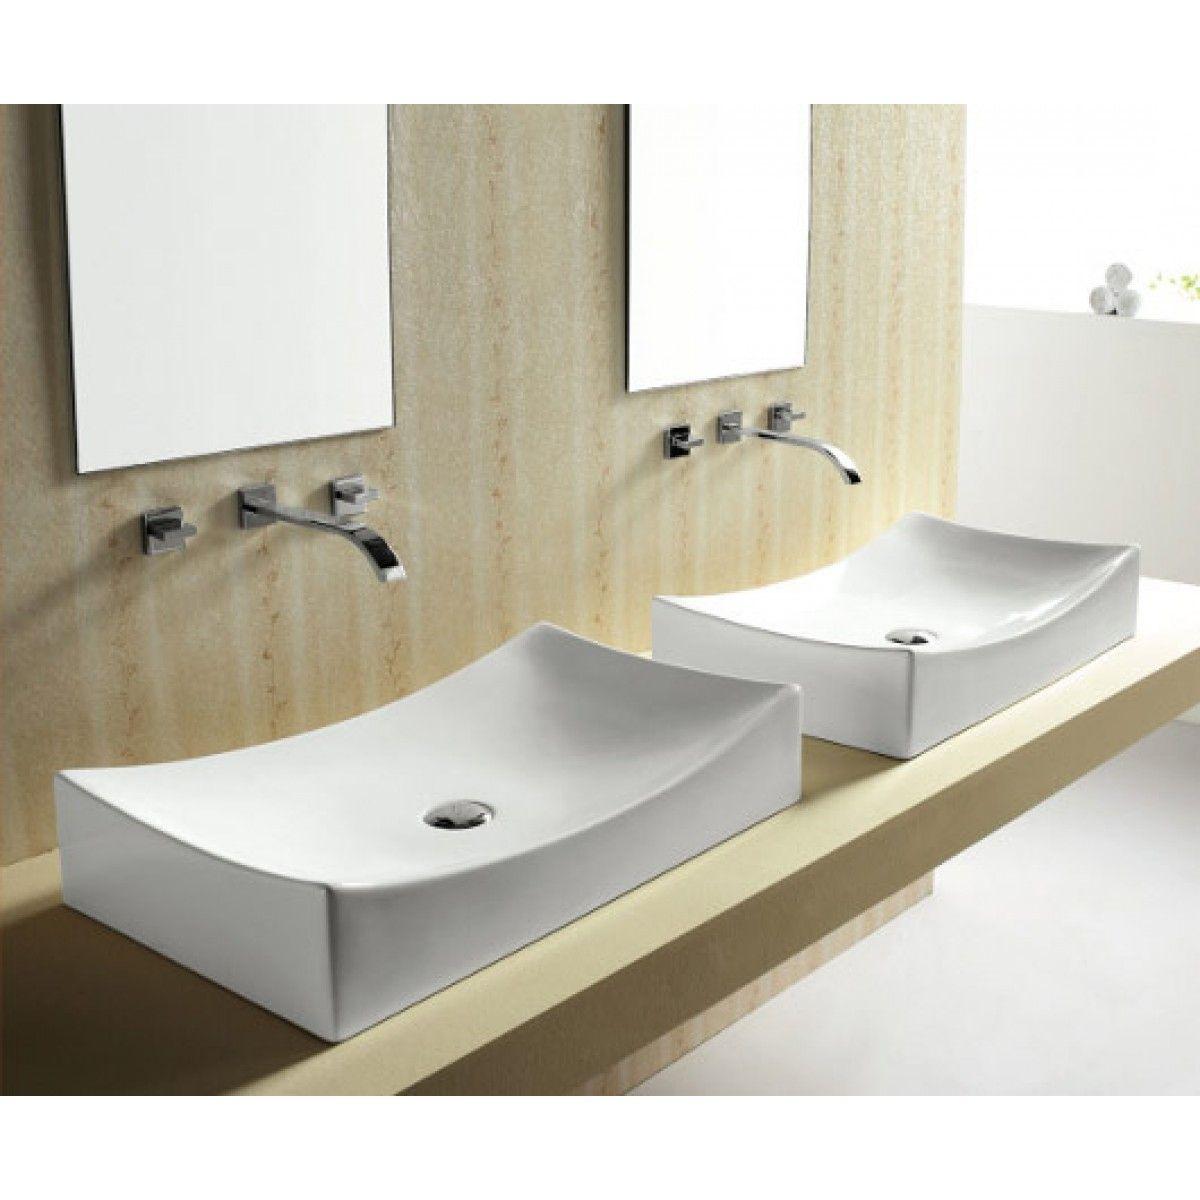 Superieur European Style Bathroom Sinks